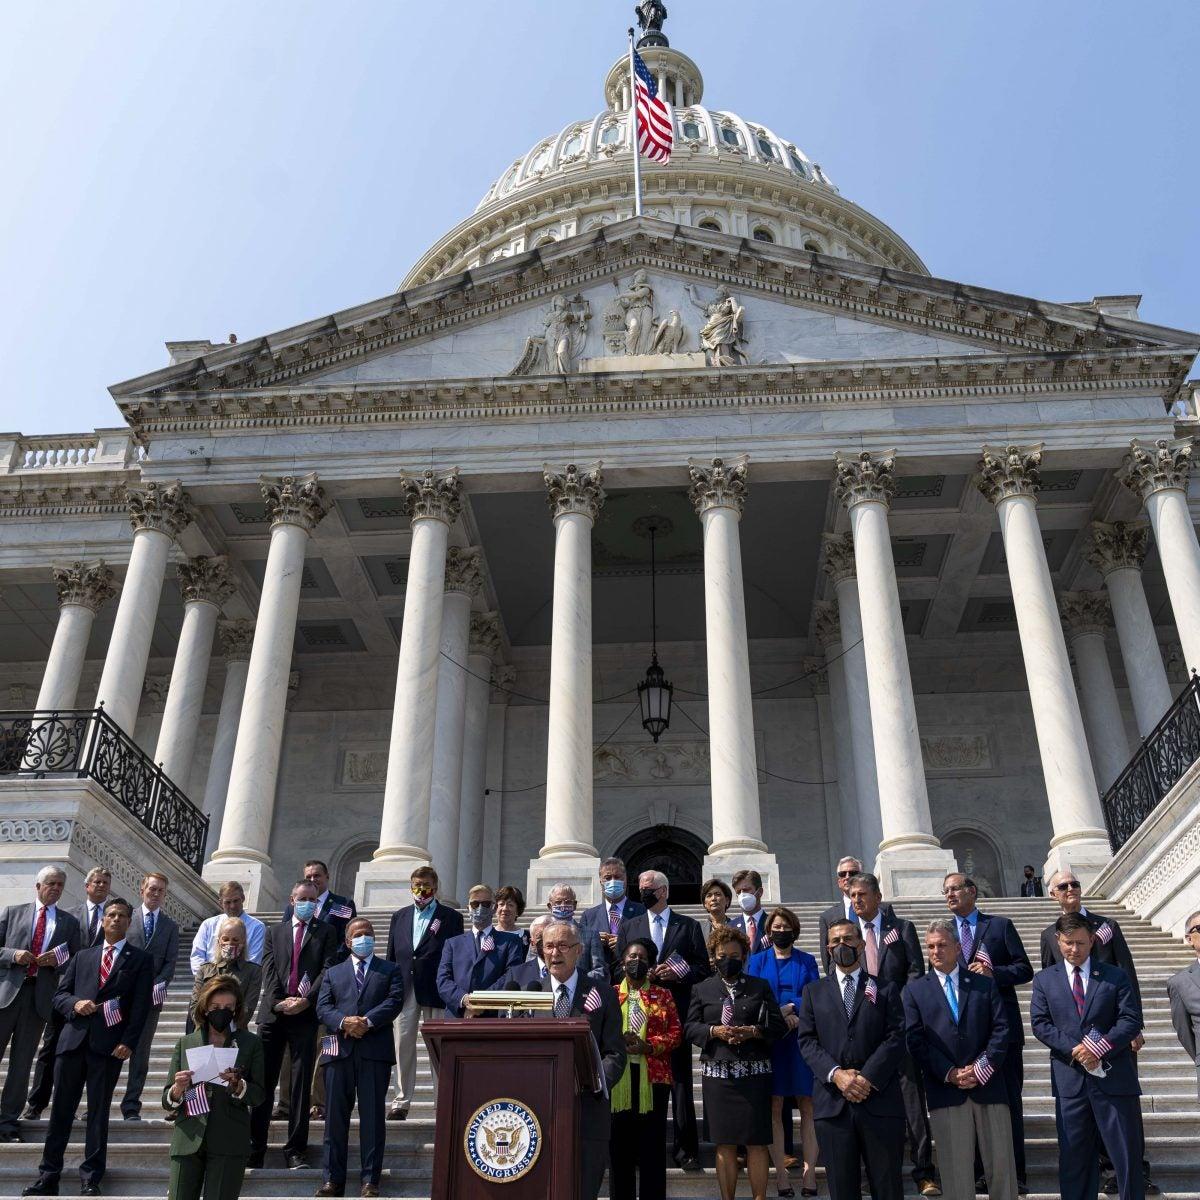 Congress Commemorates 20th Anniversary of 9/11